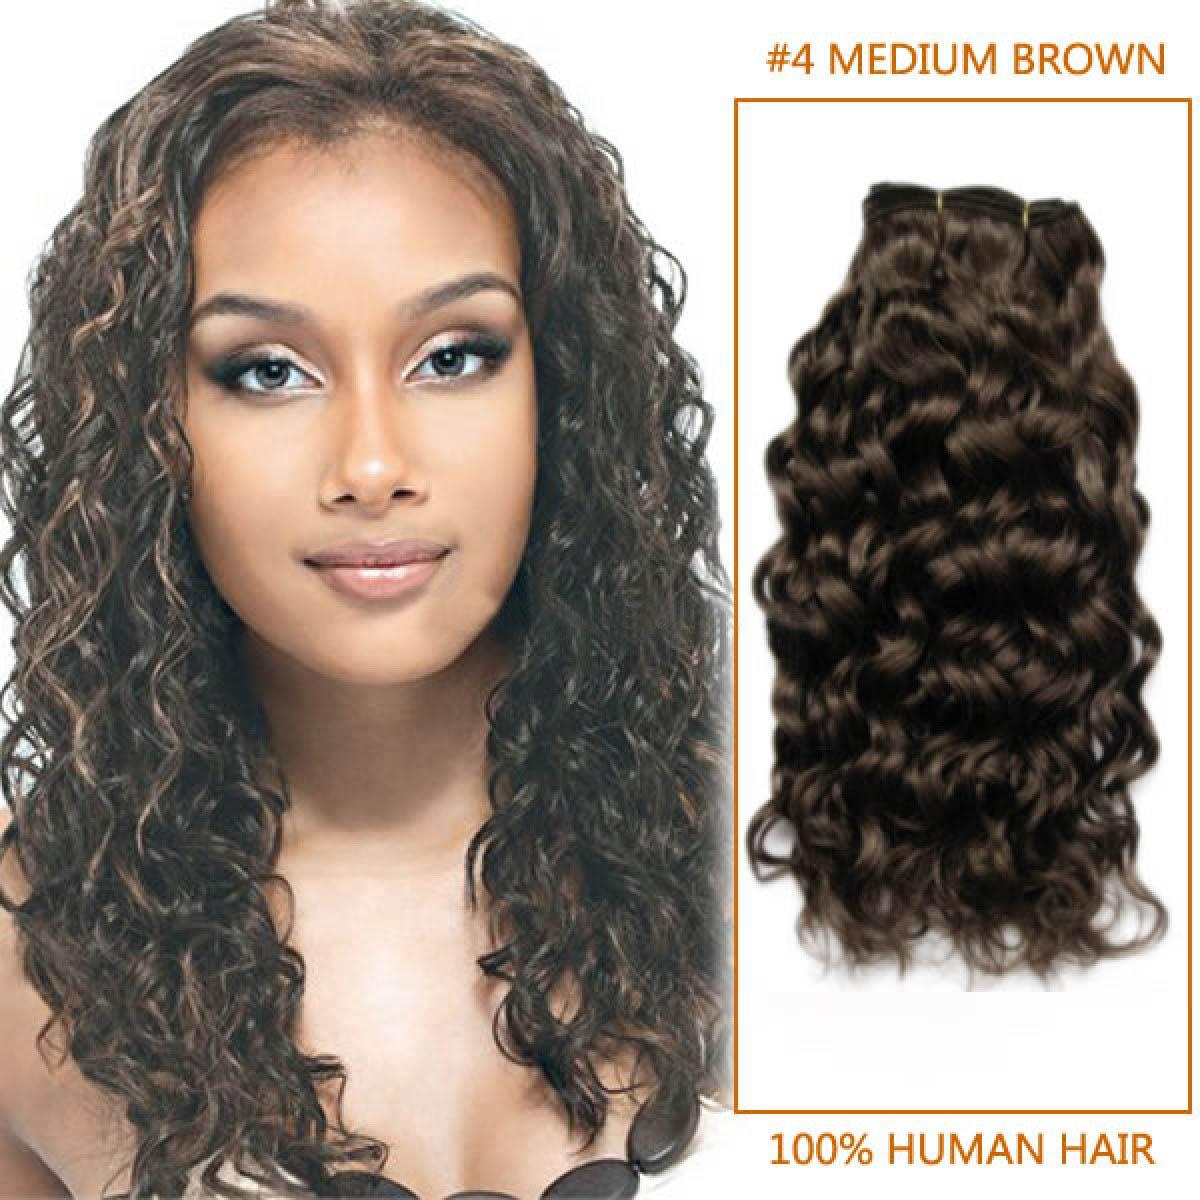 16 Inch 4 Medium Brown Curly Brazilian Virgin Hair Wefts